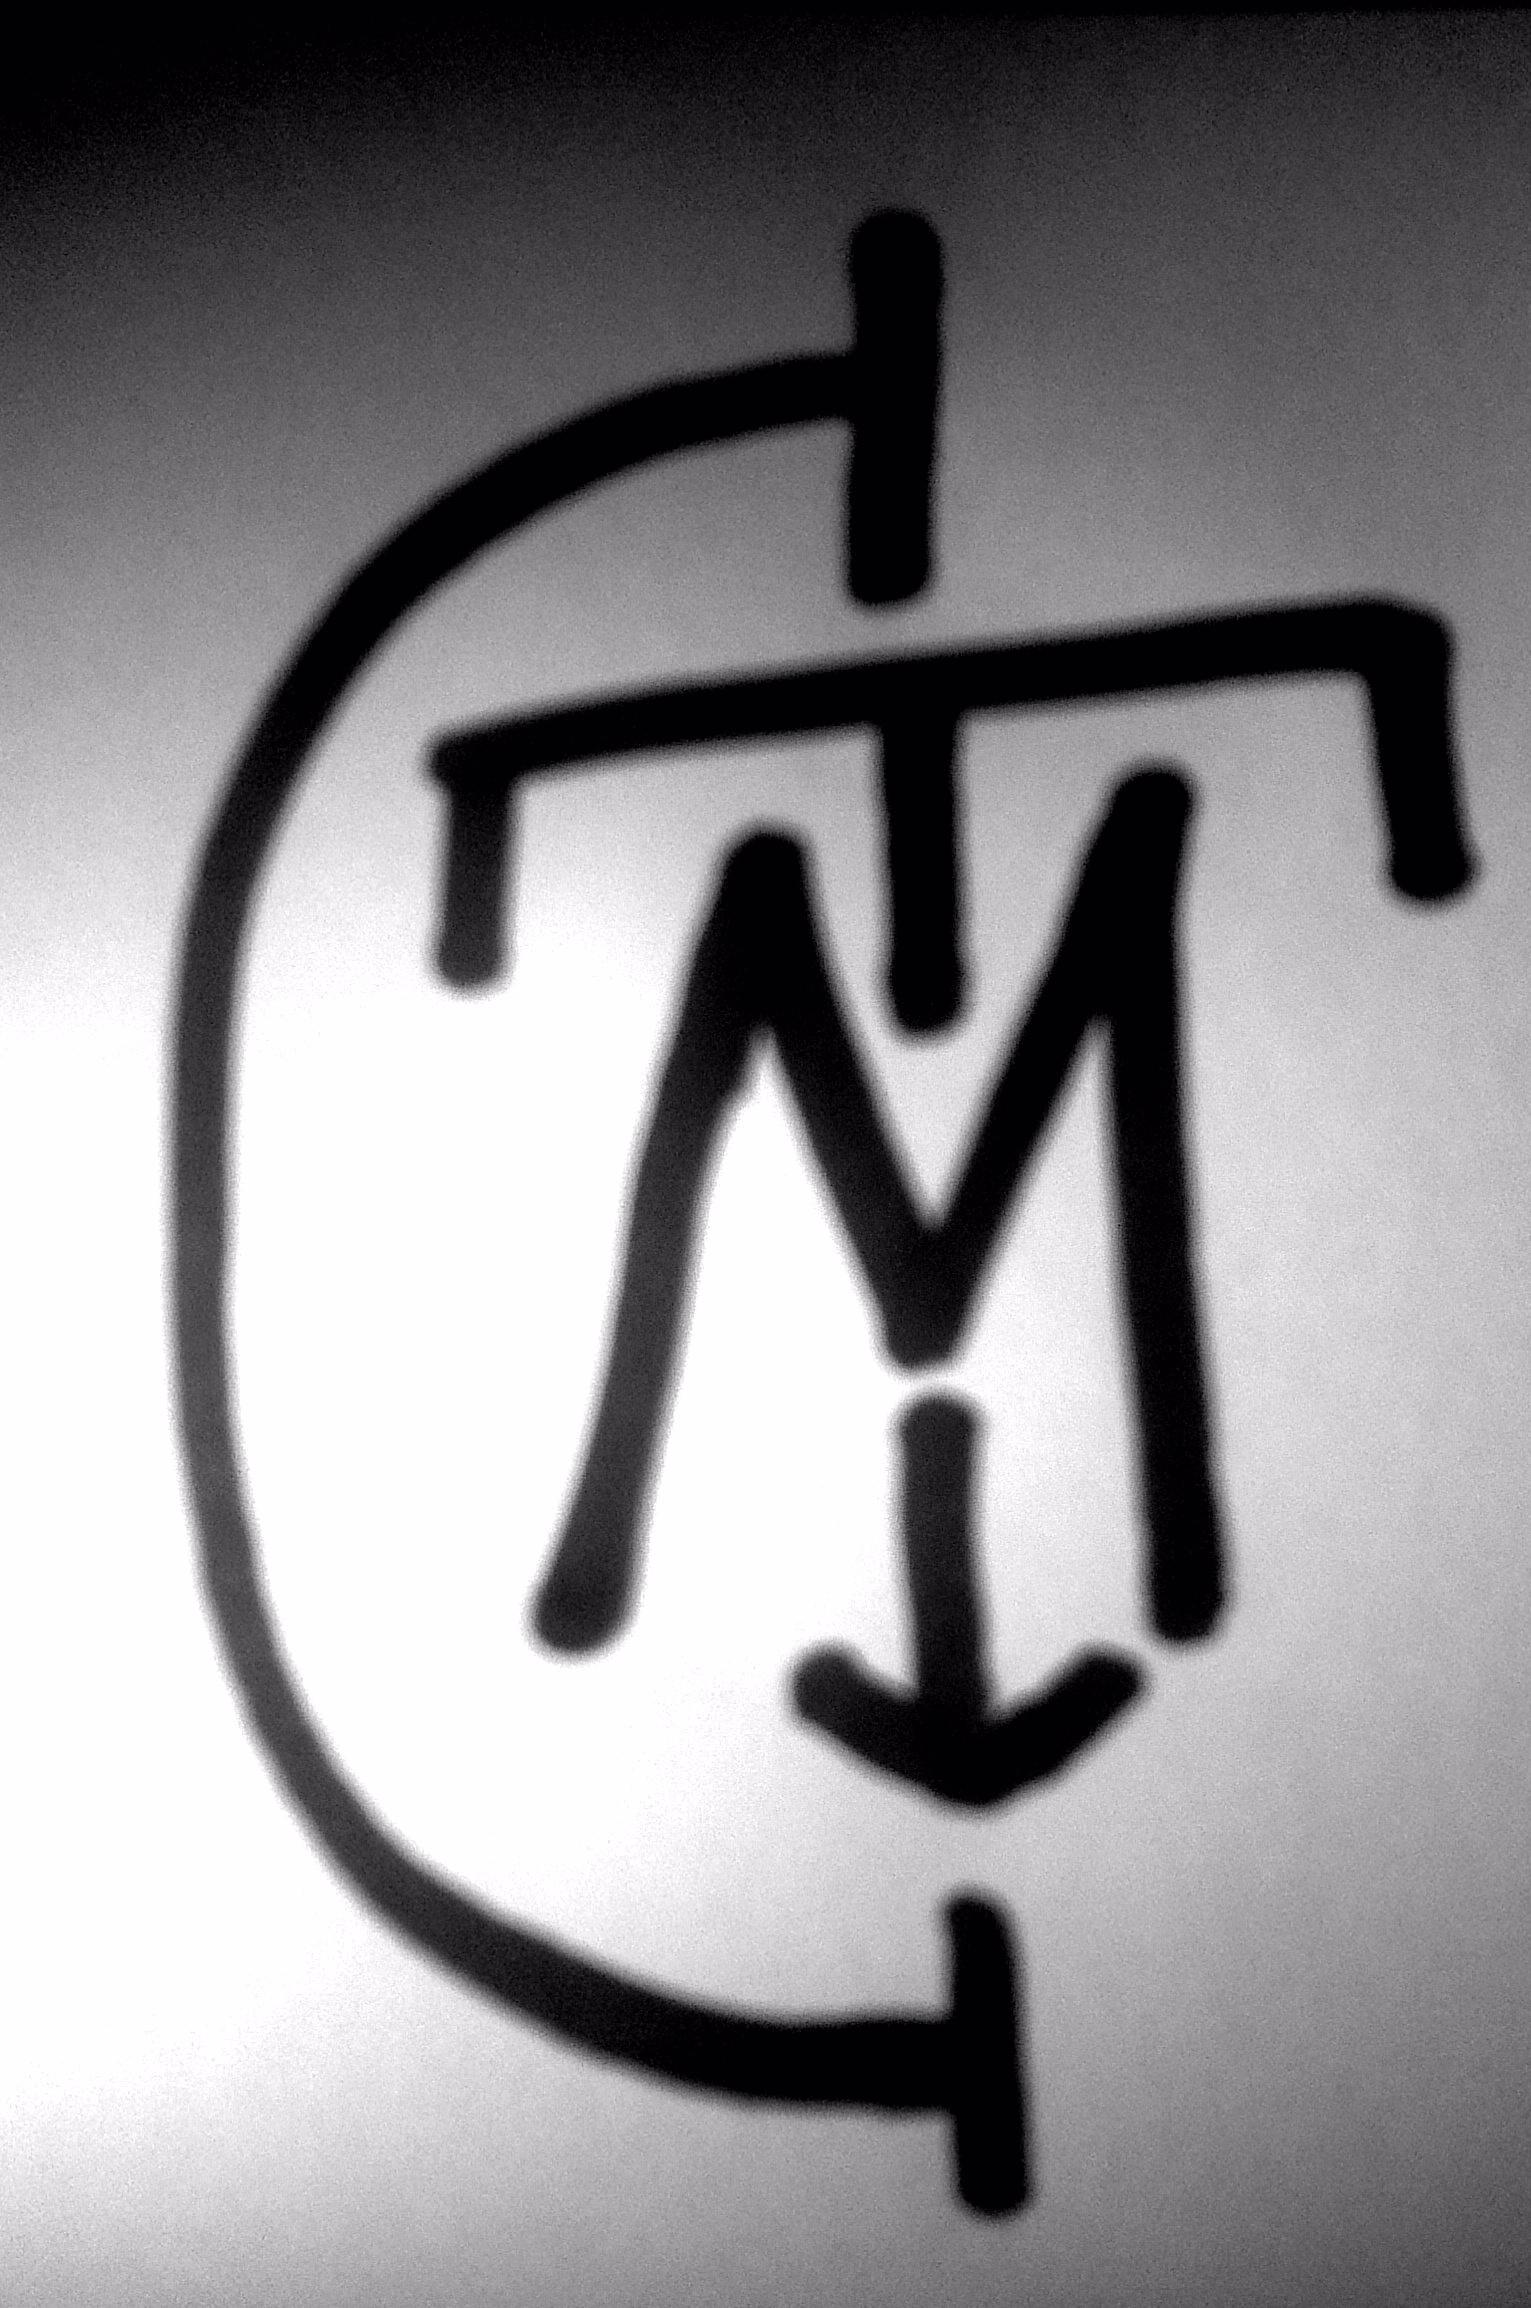 Matthew Troup's Signature